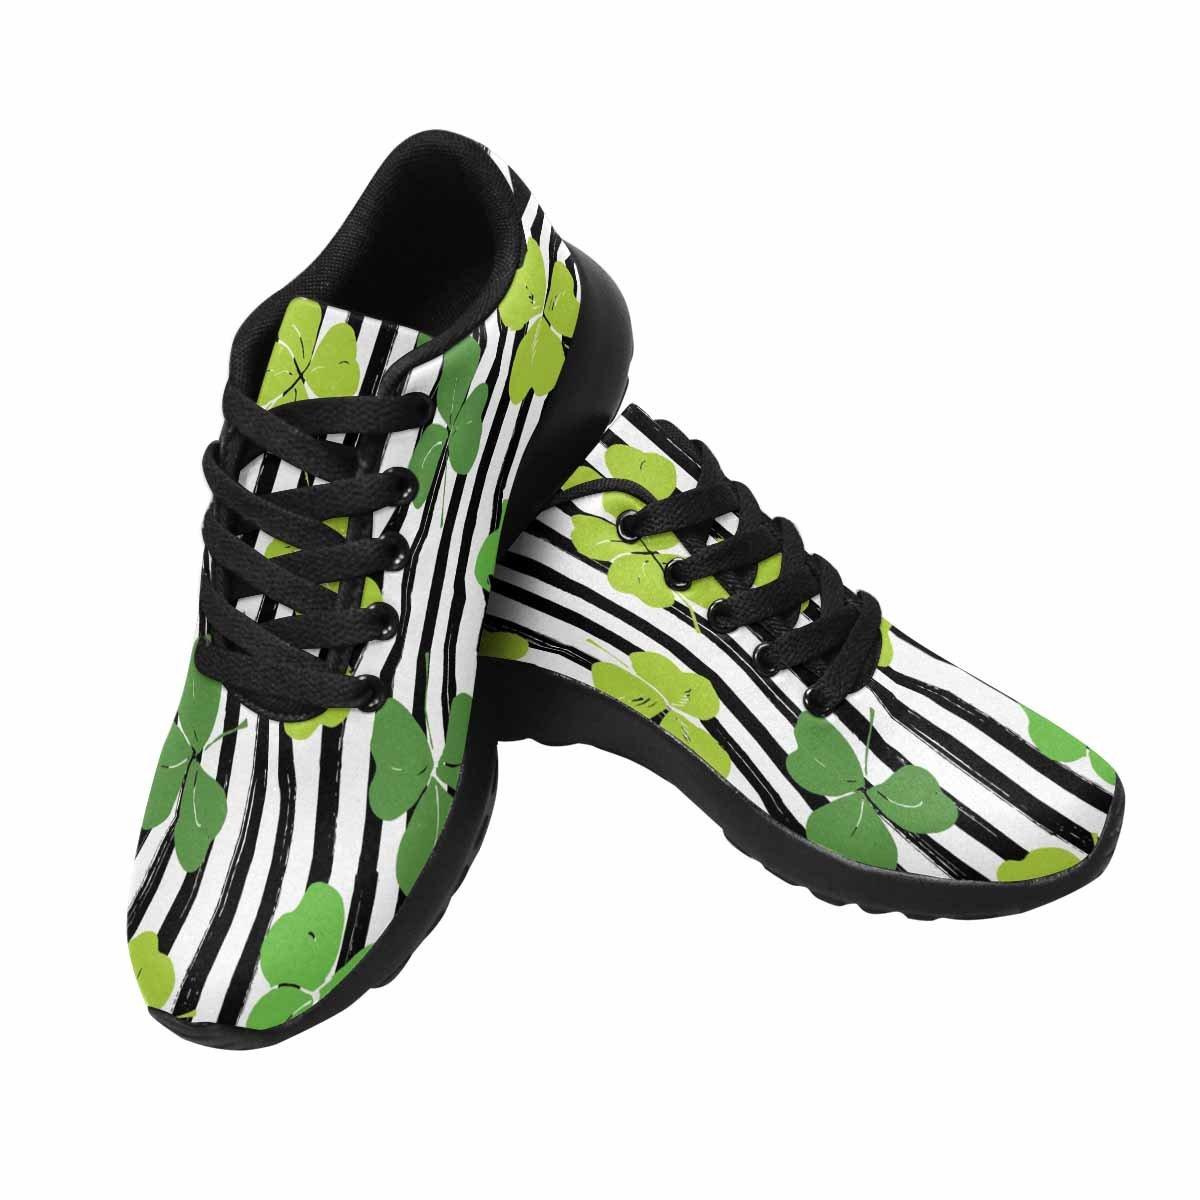 InterestPrint Women's Jogging Running Sneaker Lightweight Go Easy Walking Comfort Sports Running Shoes Clover Leaf St Patrick's Day 6 B(M) US